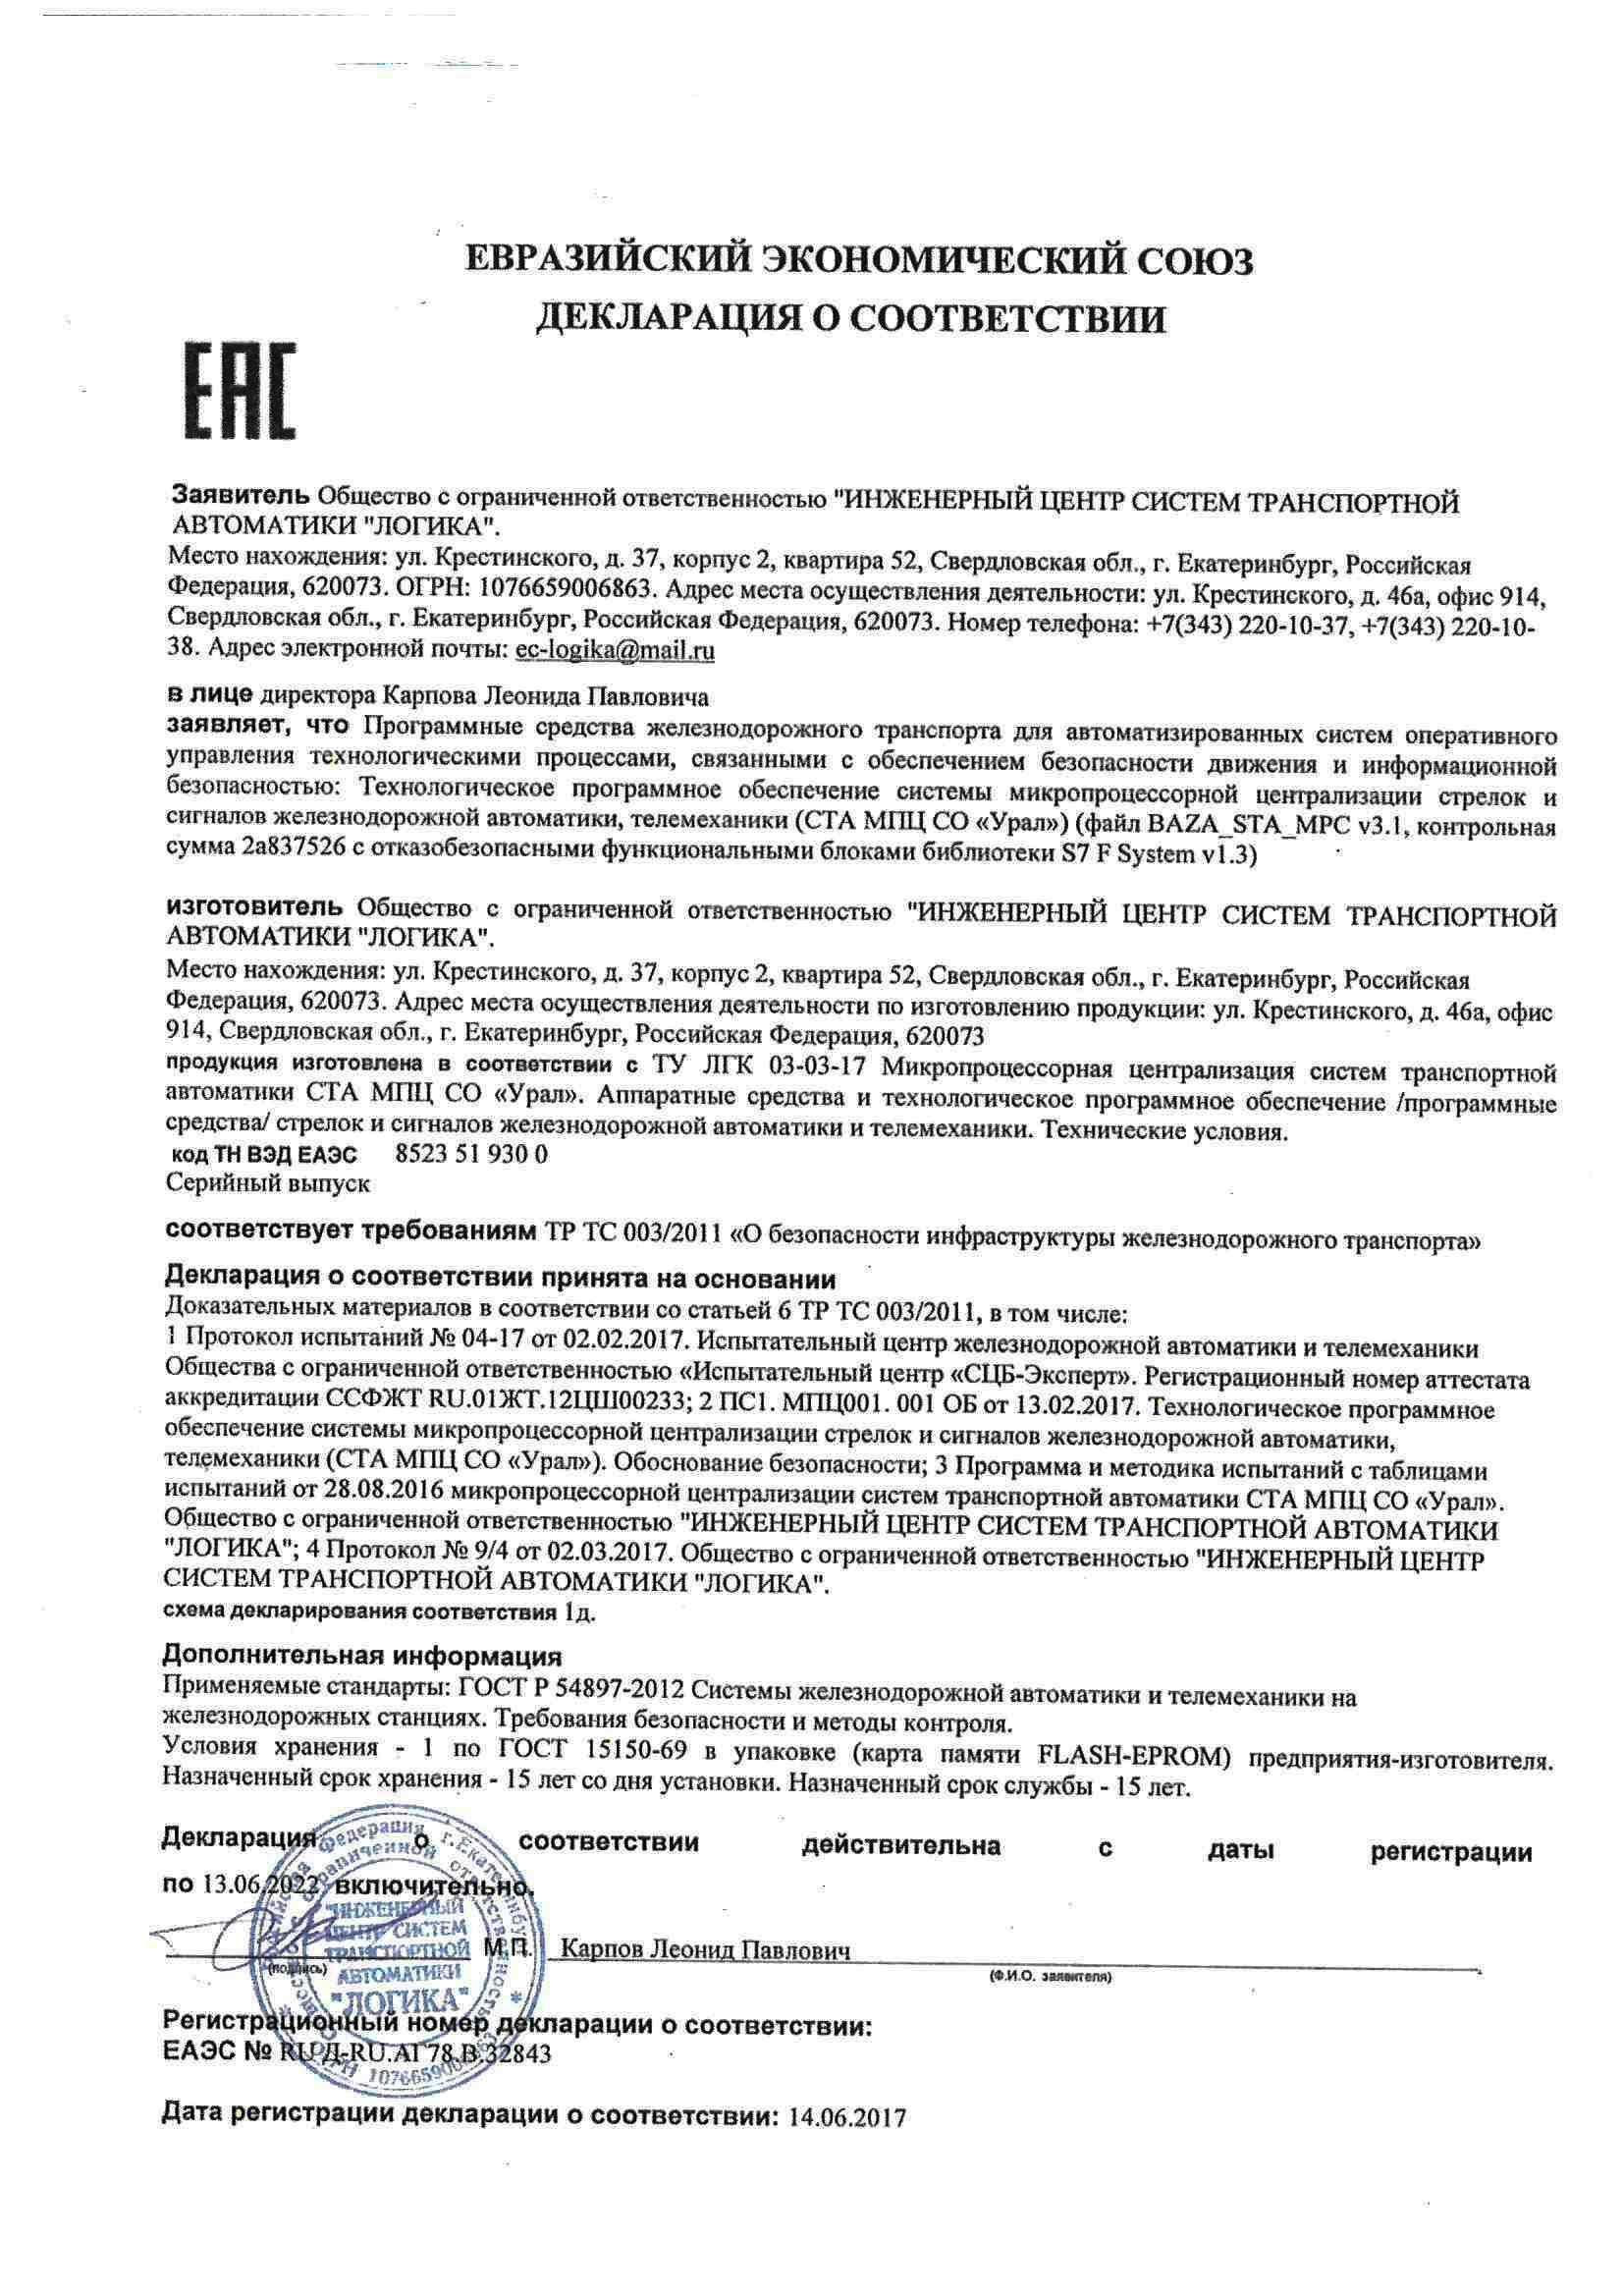 РосТехНадзор Siemens (стр. 1)